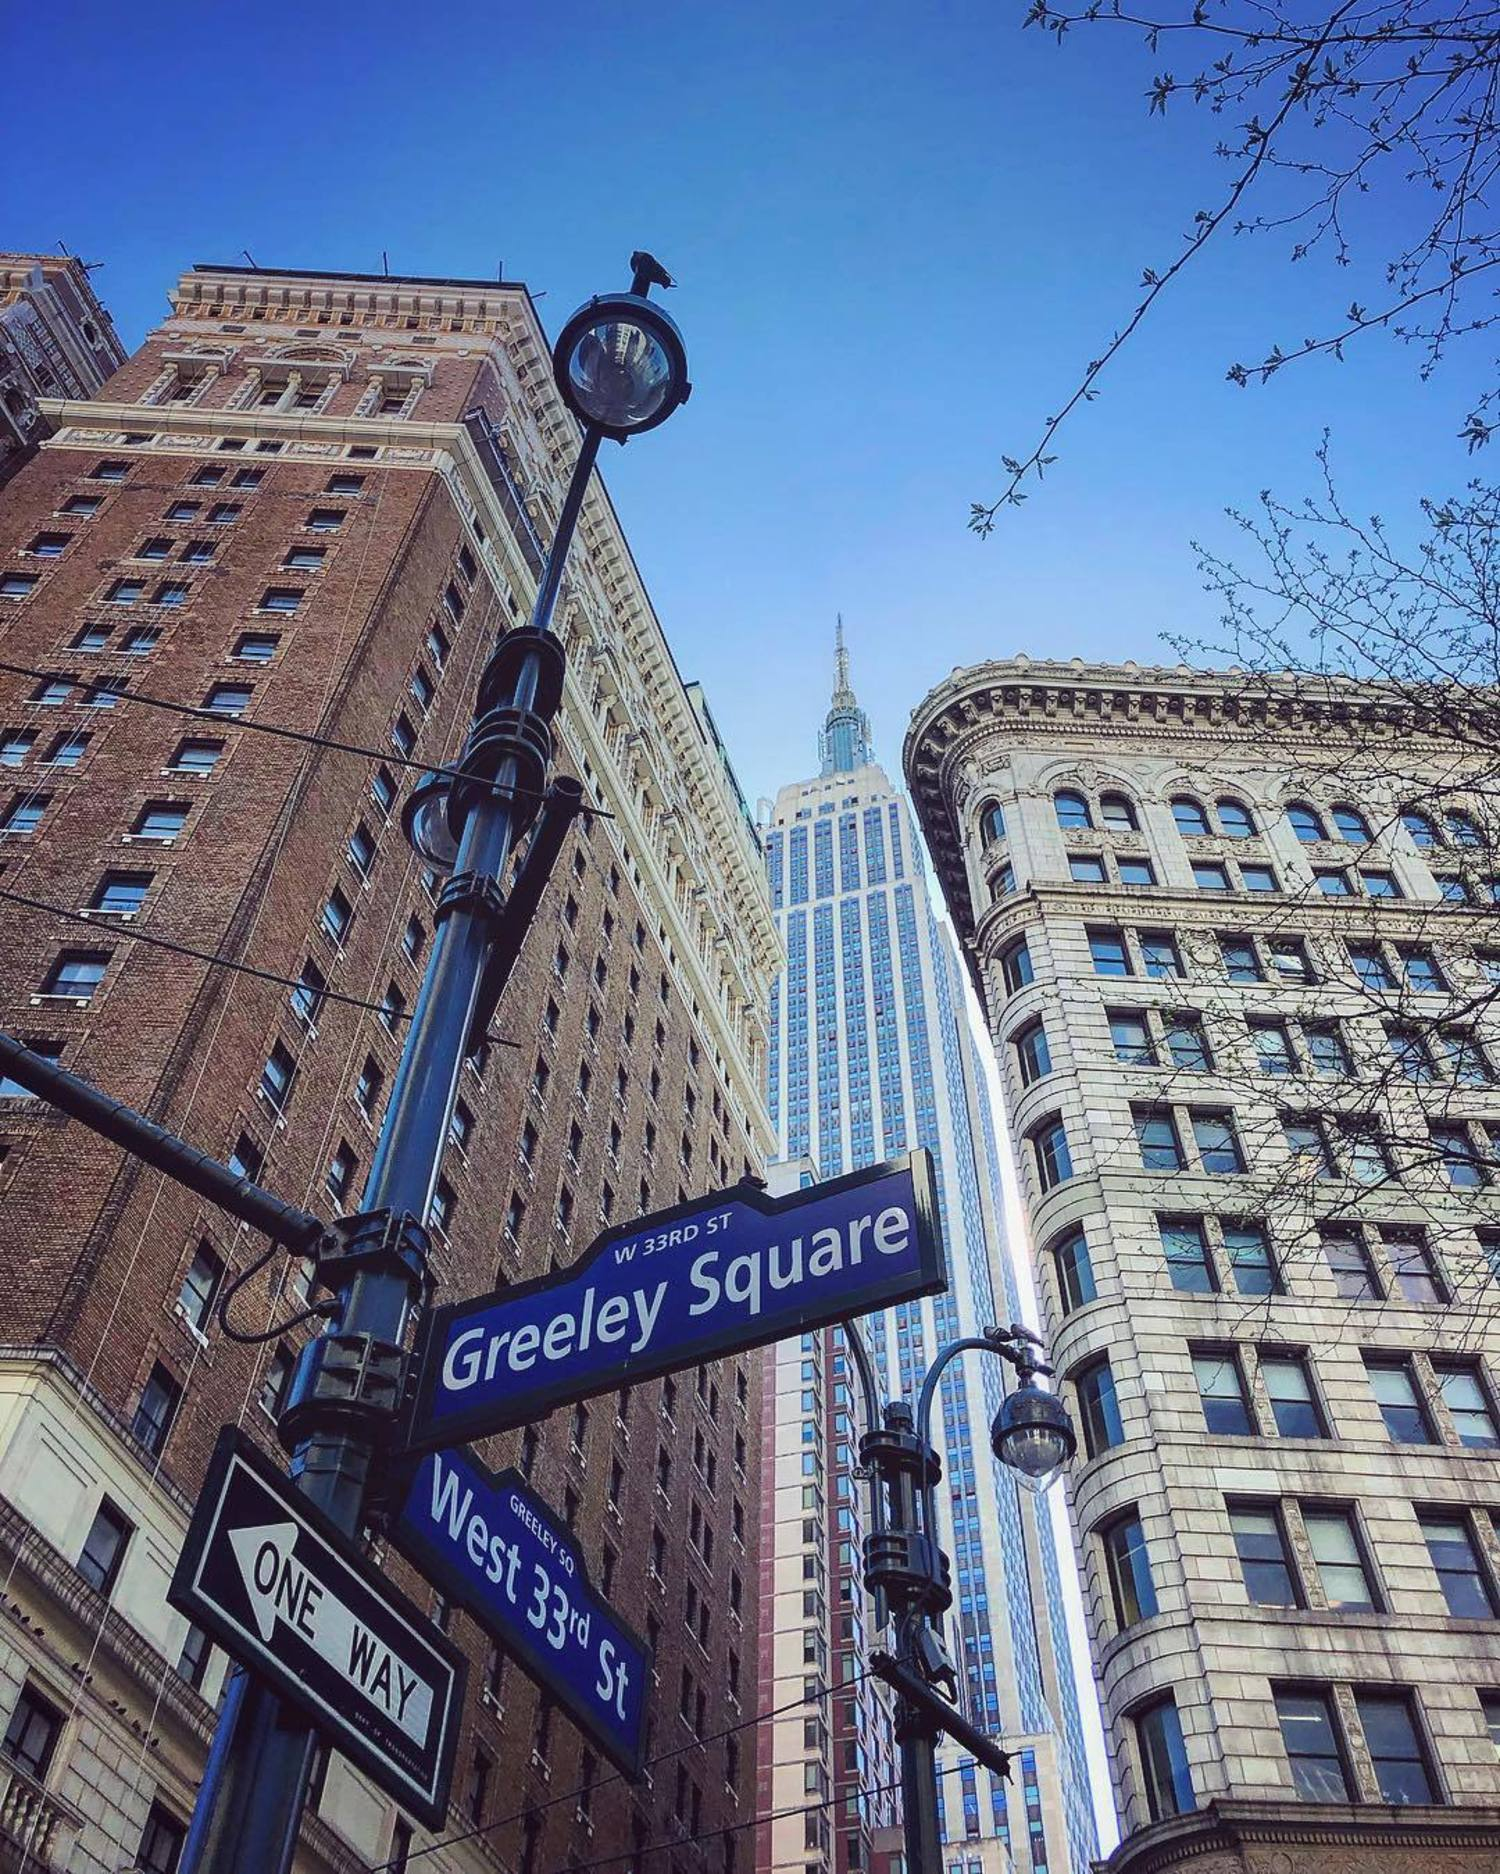 Herald Square / Greeley Square, Manhattan